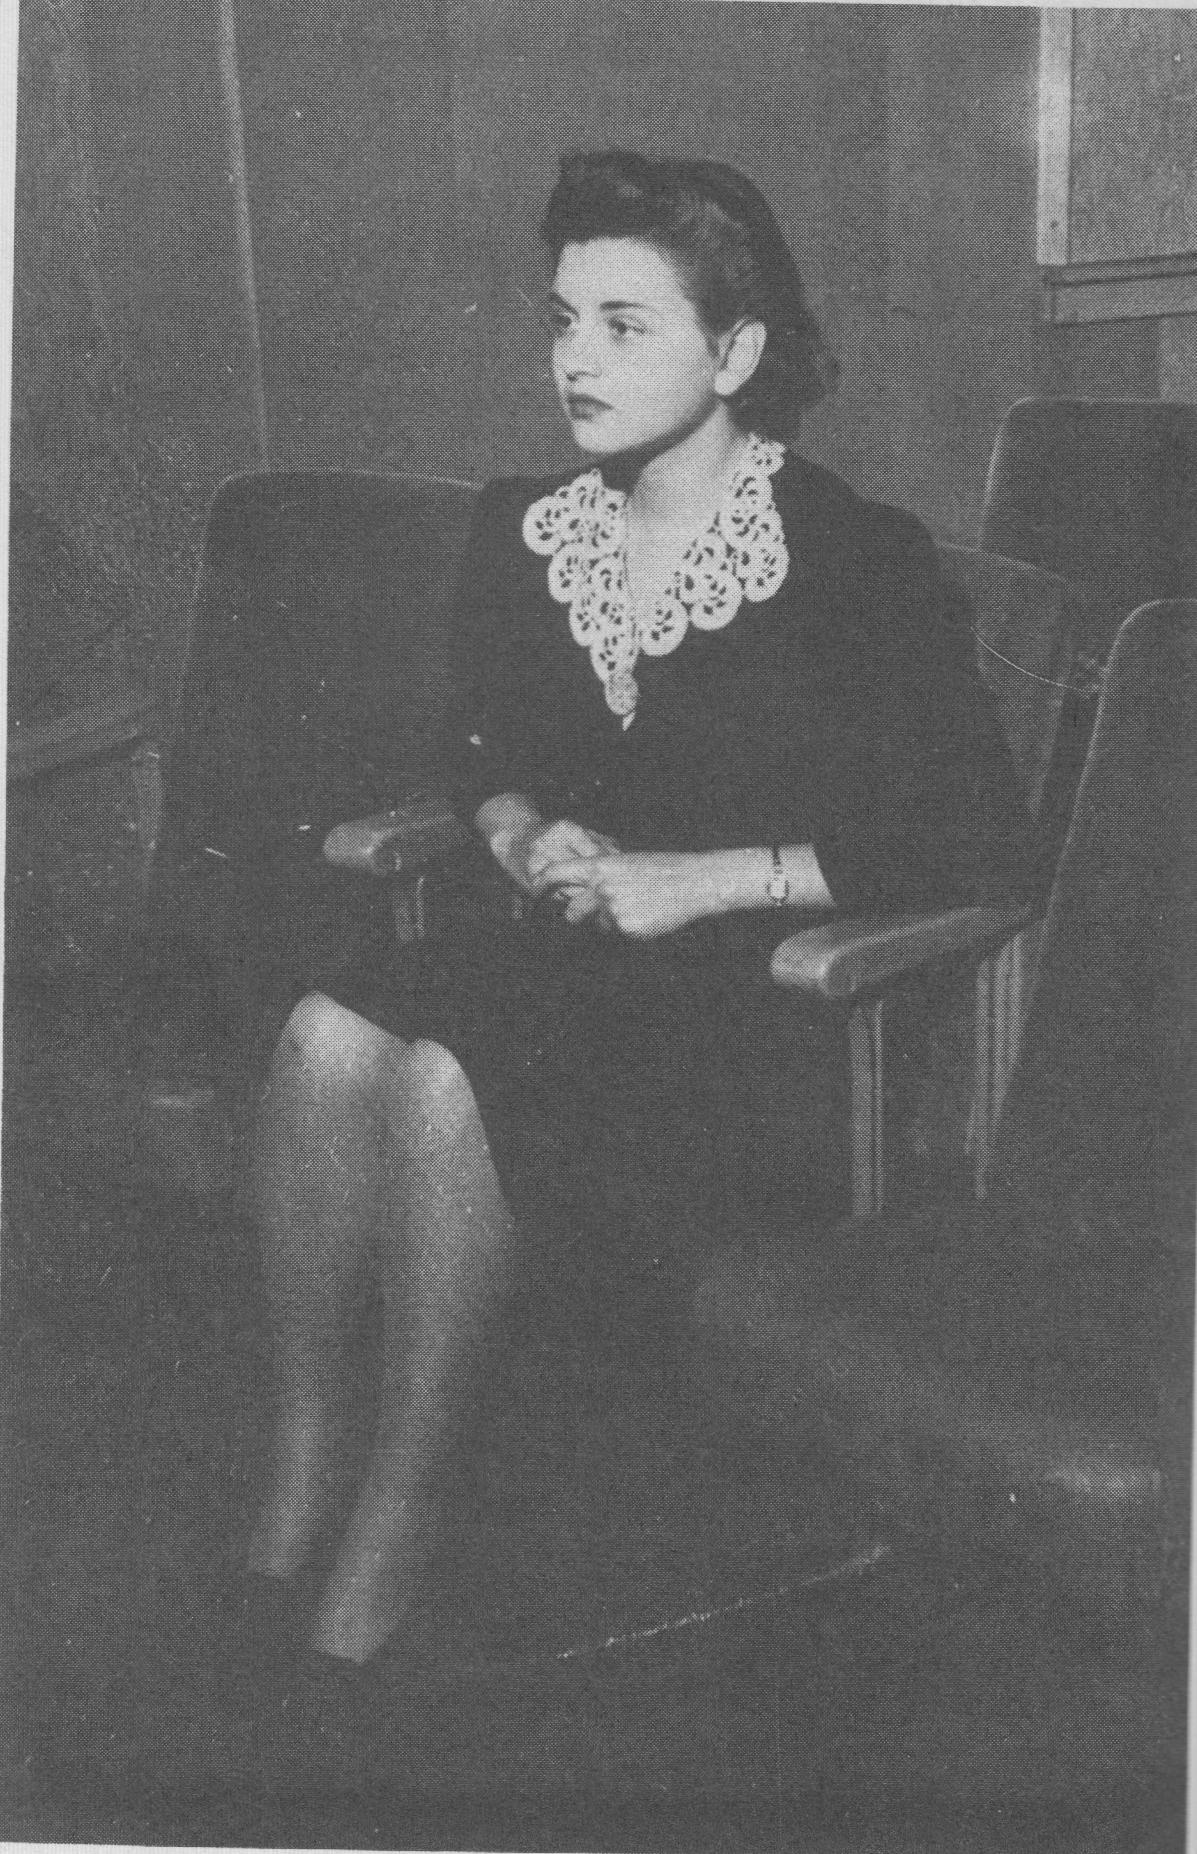 Zerka Toeman Moreno